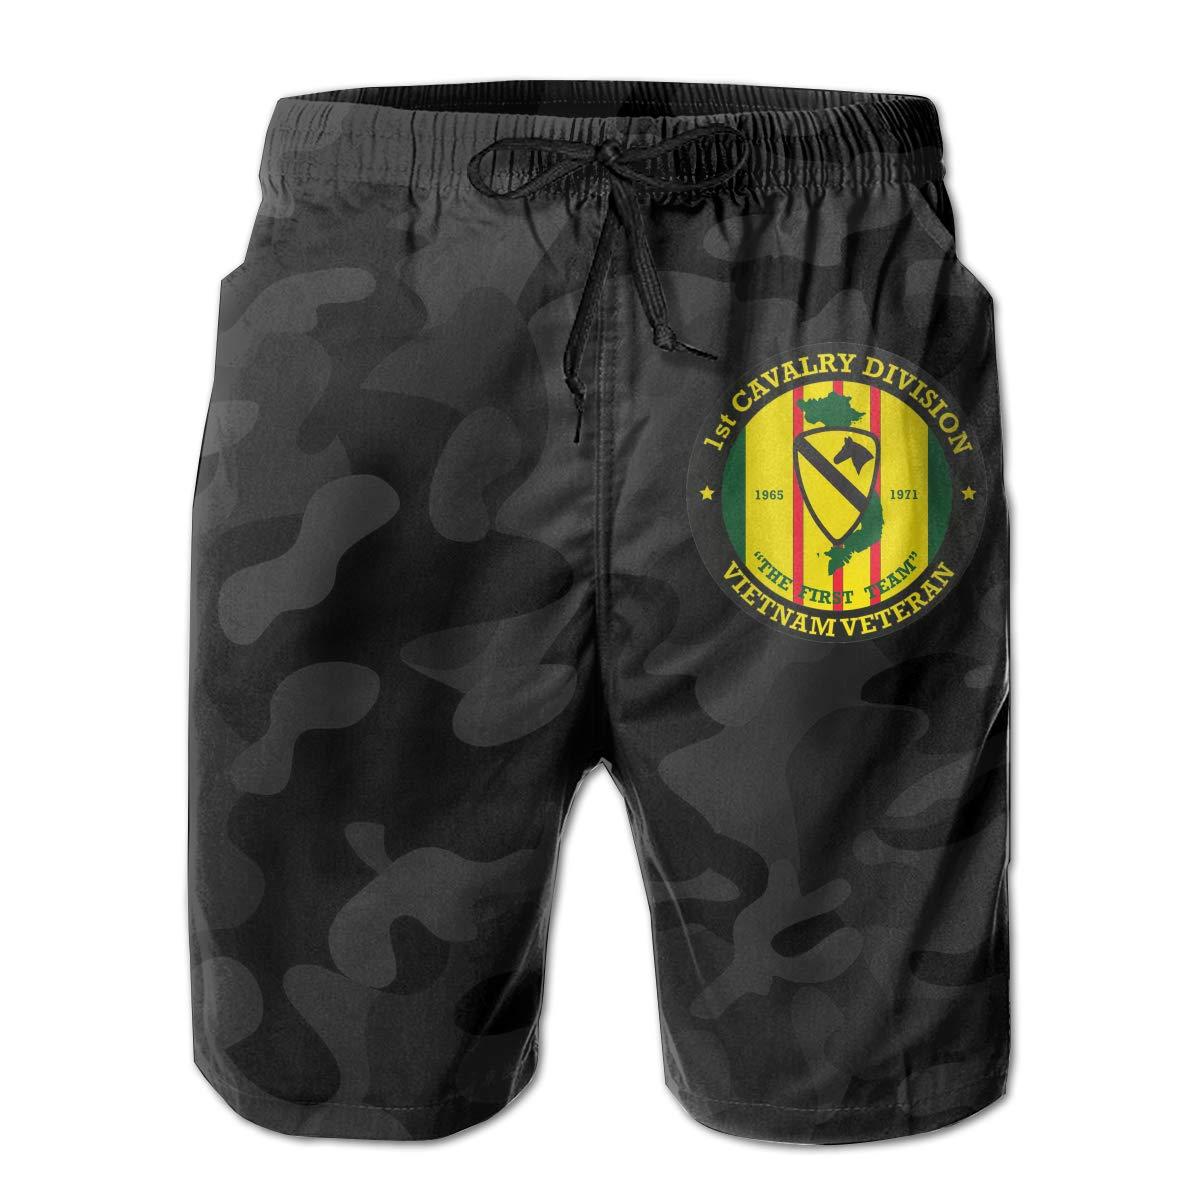 Hdecrr FFRE 1st Cavalry Division Vietnam Veteran Men Summer Casual Beach Shorts Quick Dry Swim Trunks with Pockets